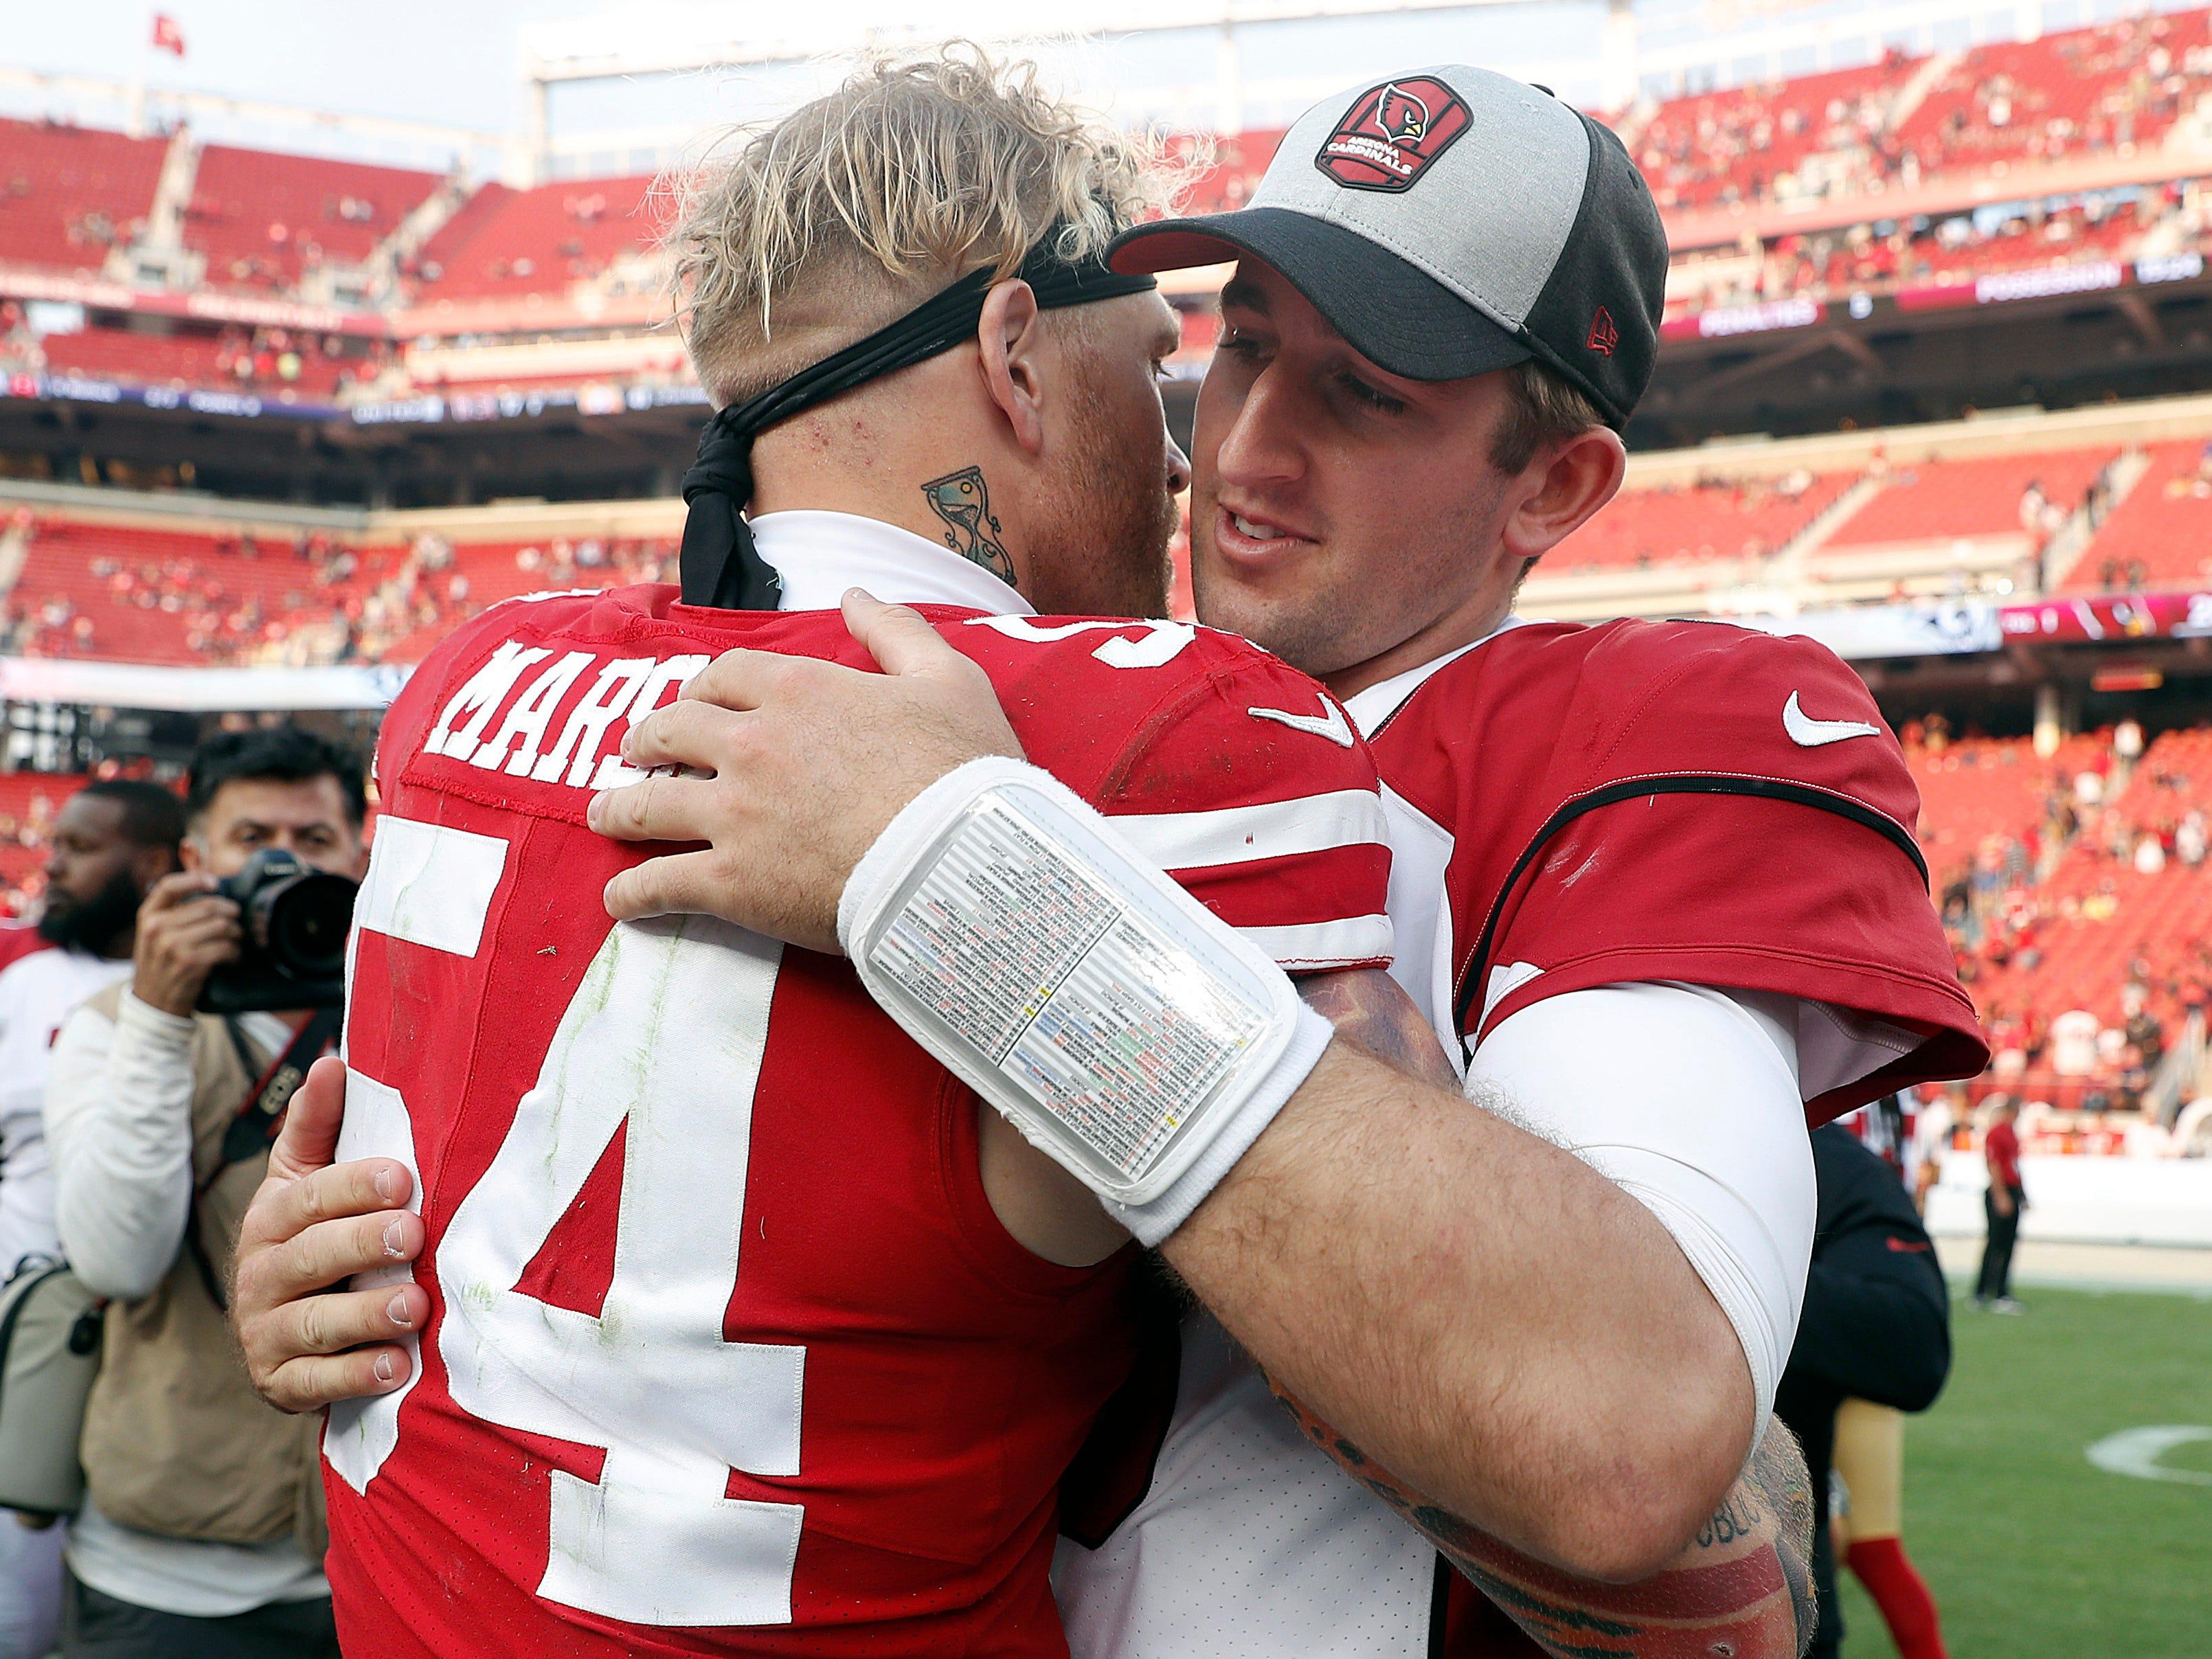 Arizona Cardinals quarterback Josh Rosen, right, hugs San Francisco 49ers defensive end Cassius Marsh after an NFL football game in Santa Clara, Calif., Sunday, Oct. 7, 2018.